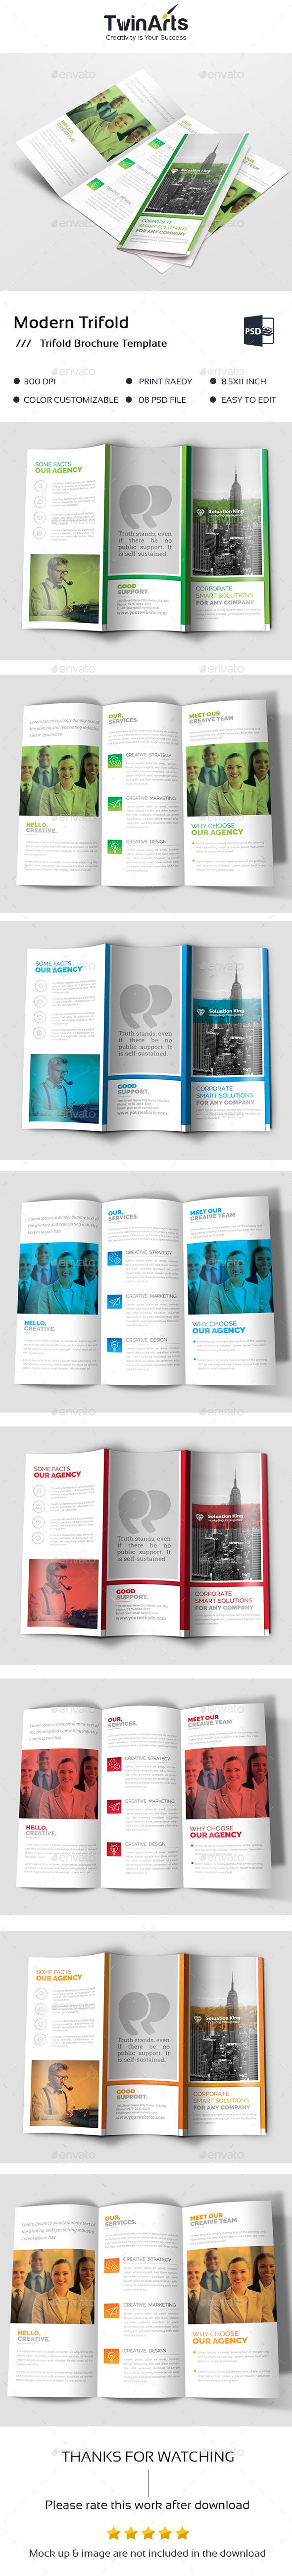 Trifold Brochure Template PSD